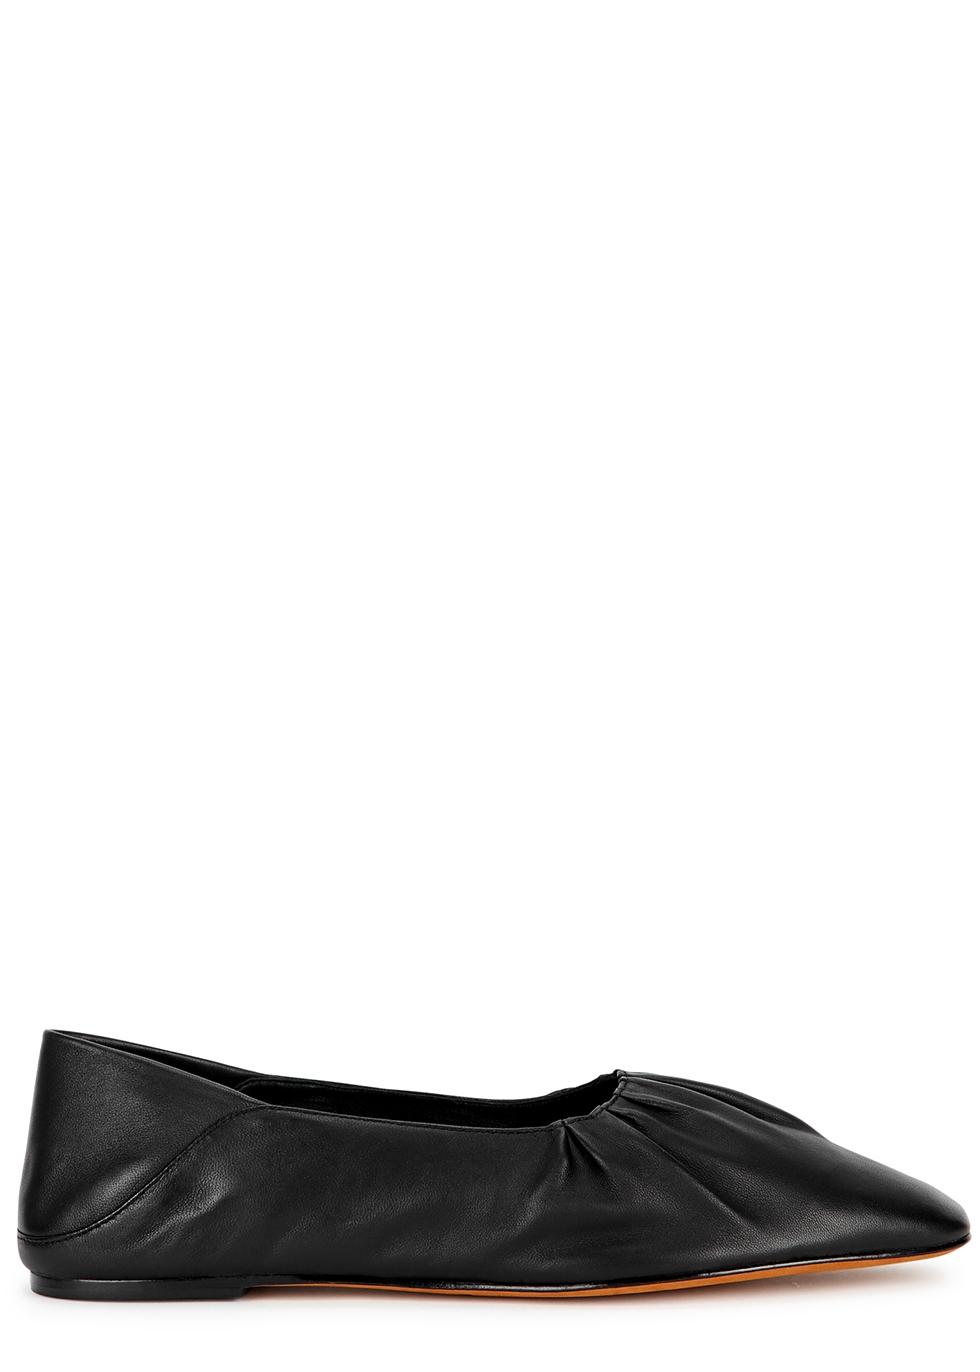 Kali black leather flats